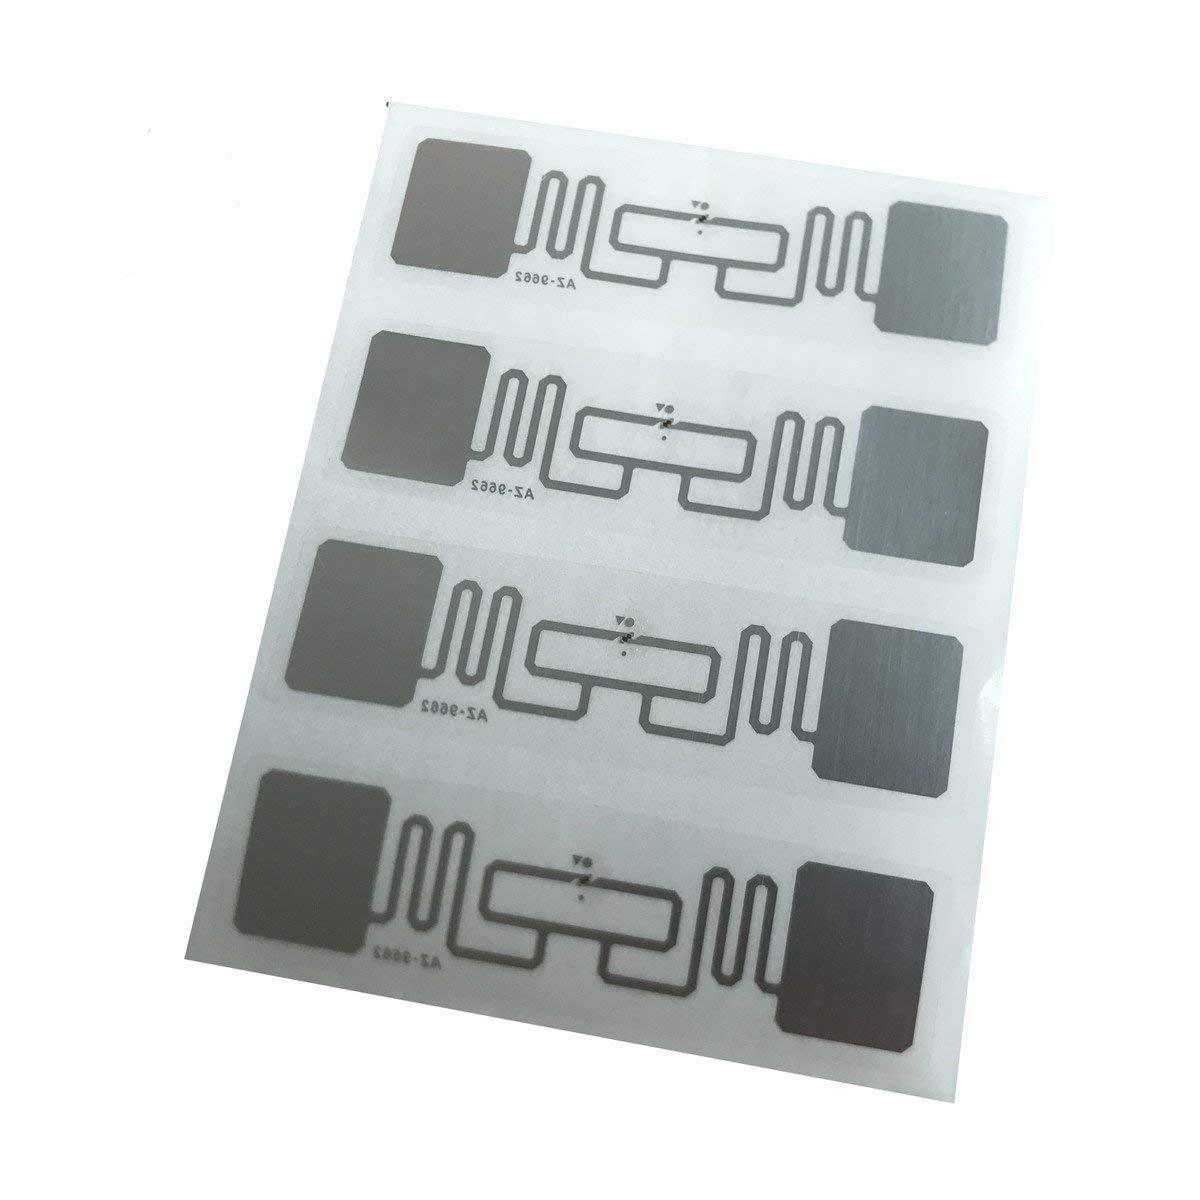 Buy 10 pcs - UHF RFID Inlay Labels / Tags UPM Raflatac FROG